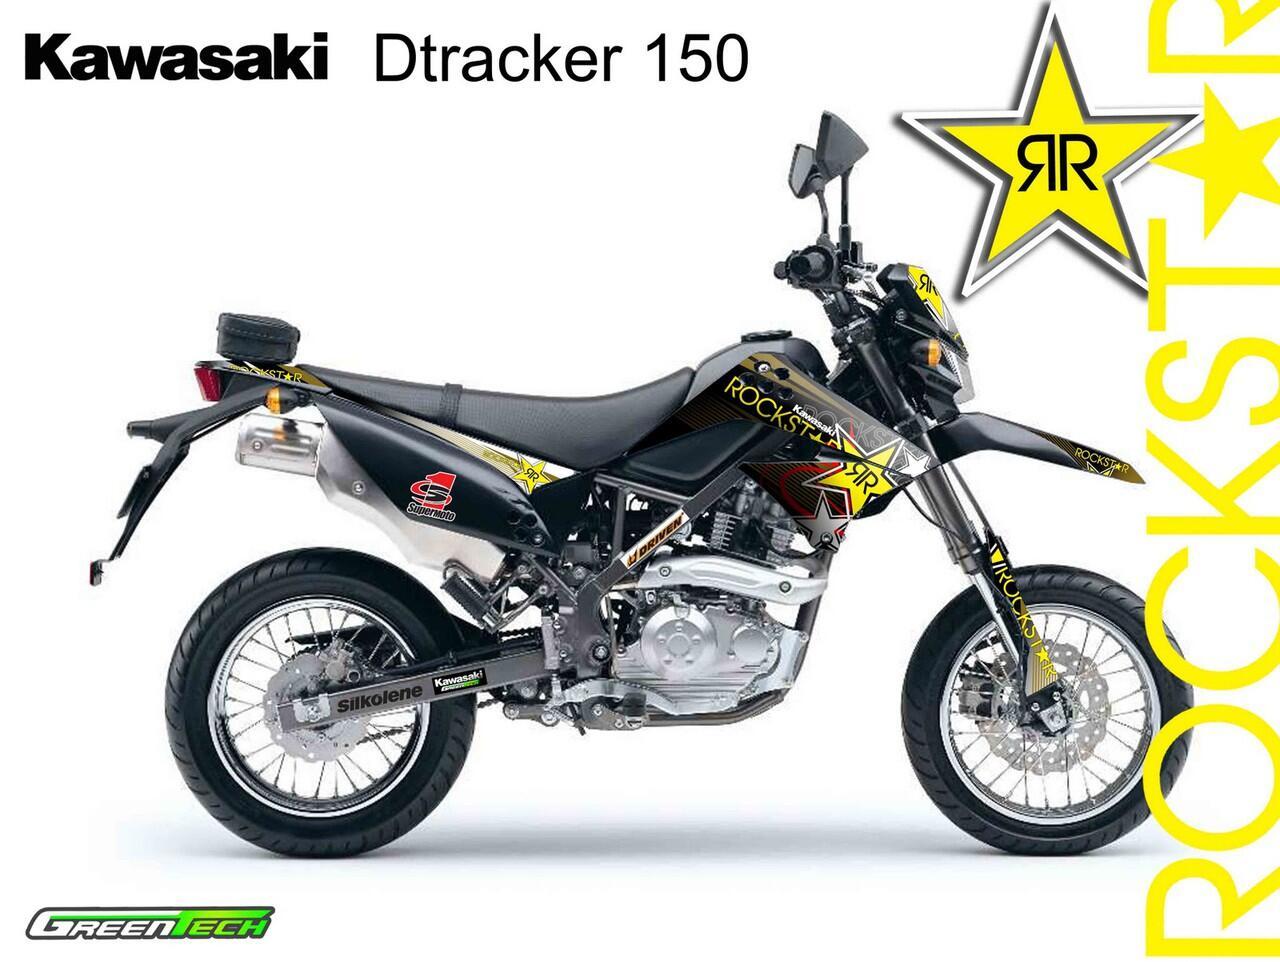 Zerografix for KLX/D-TRACKER 150